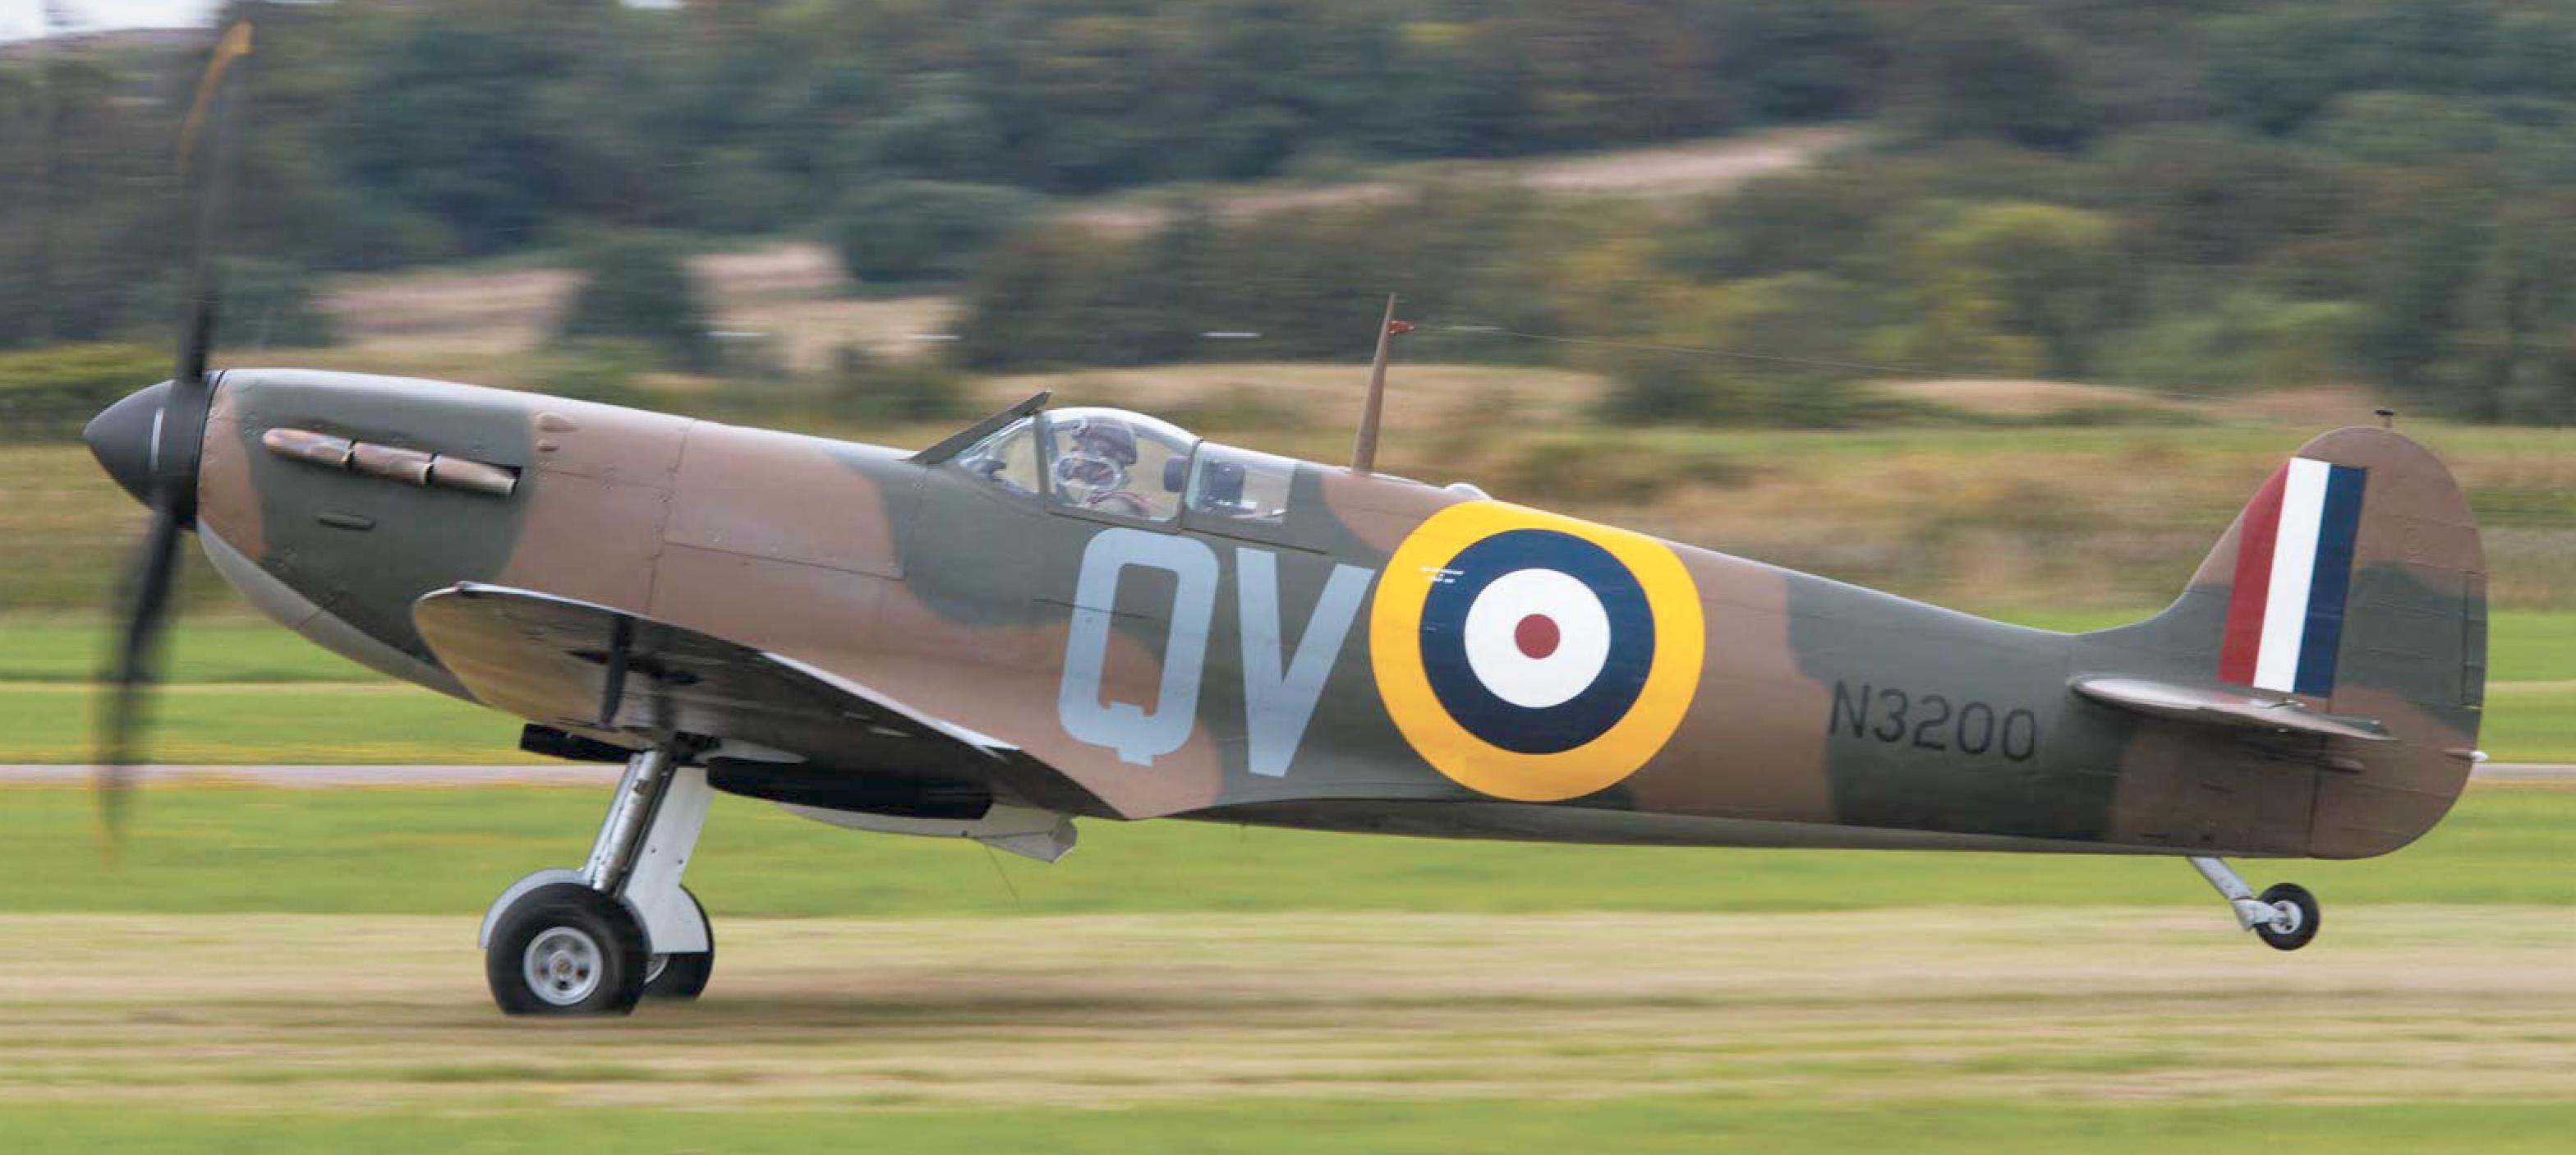 Airworthy Spitfire warbird MkI RAF 19Sqn QV N3200 and P9374 Aeroplane Sept 2015 03